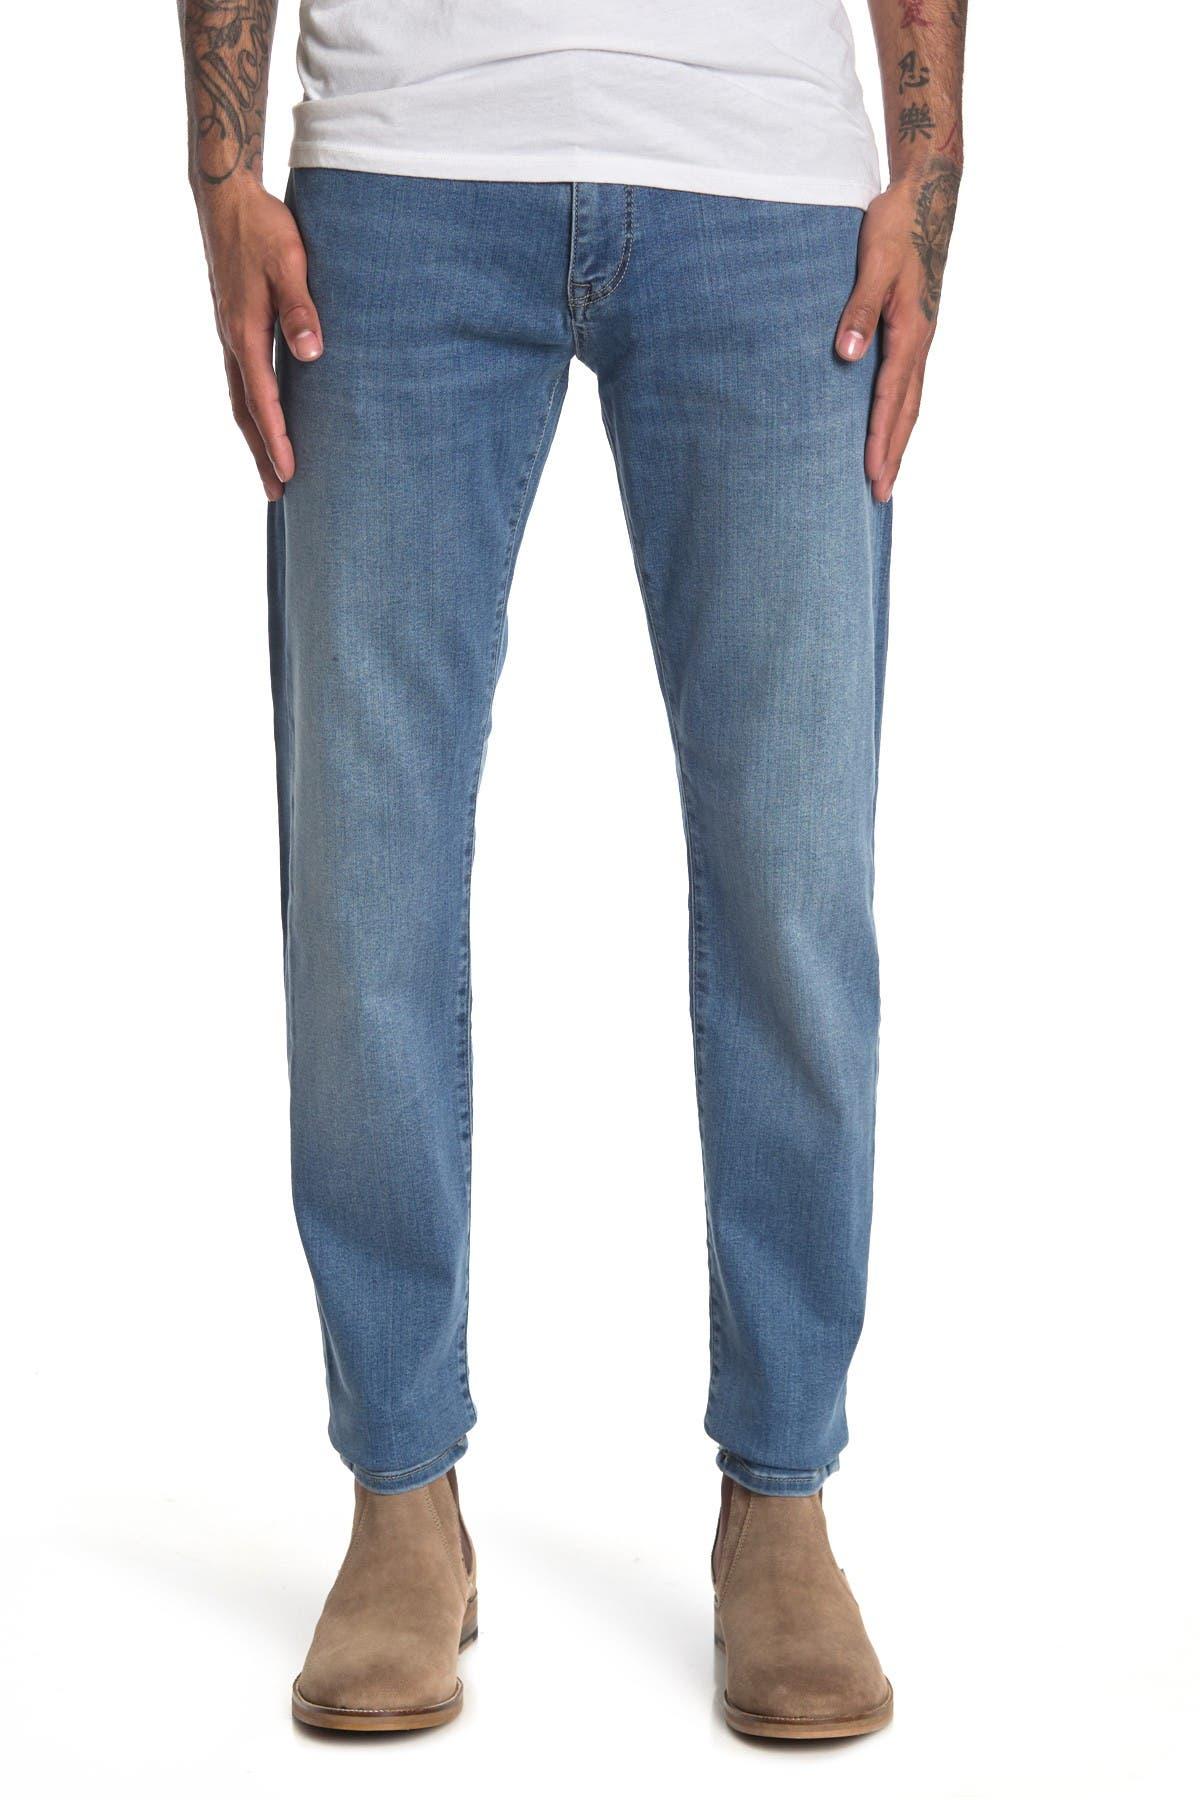 Image of Mavi Marcus Slim Straight Jeans